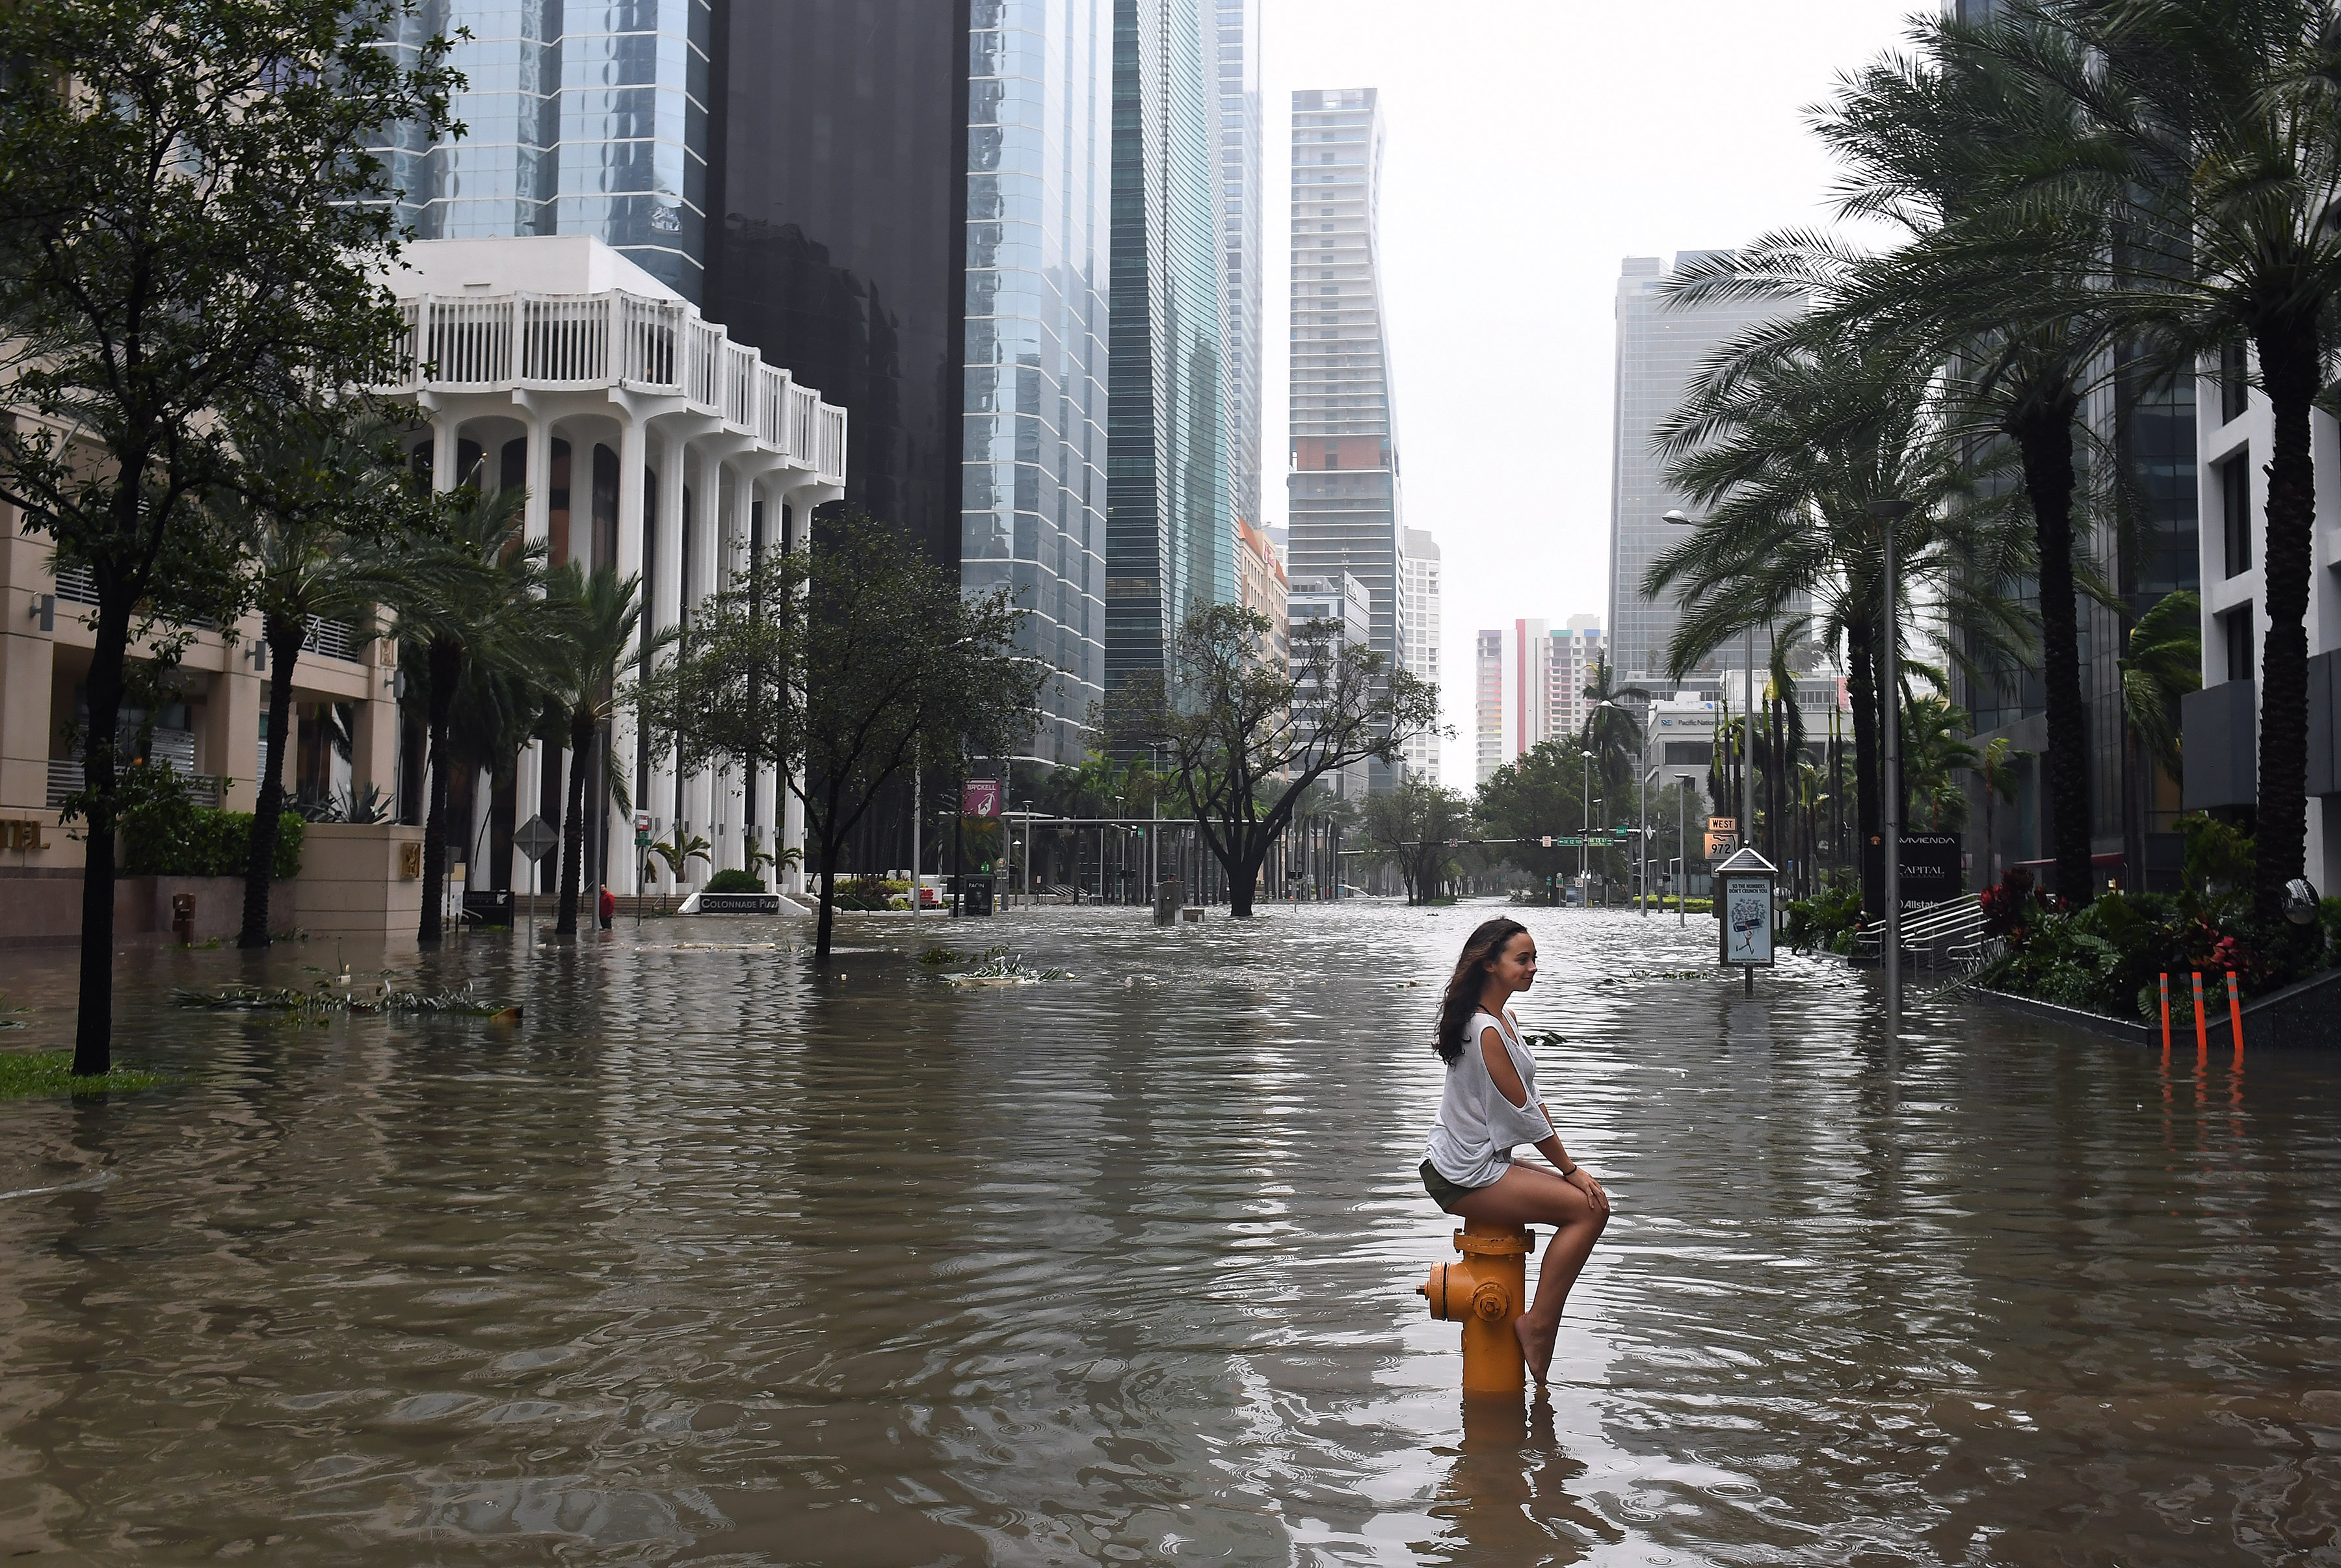 Hurricane Irma - Miami, FL